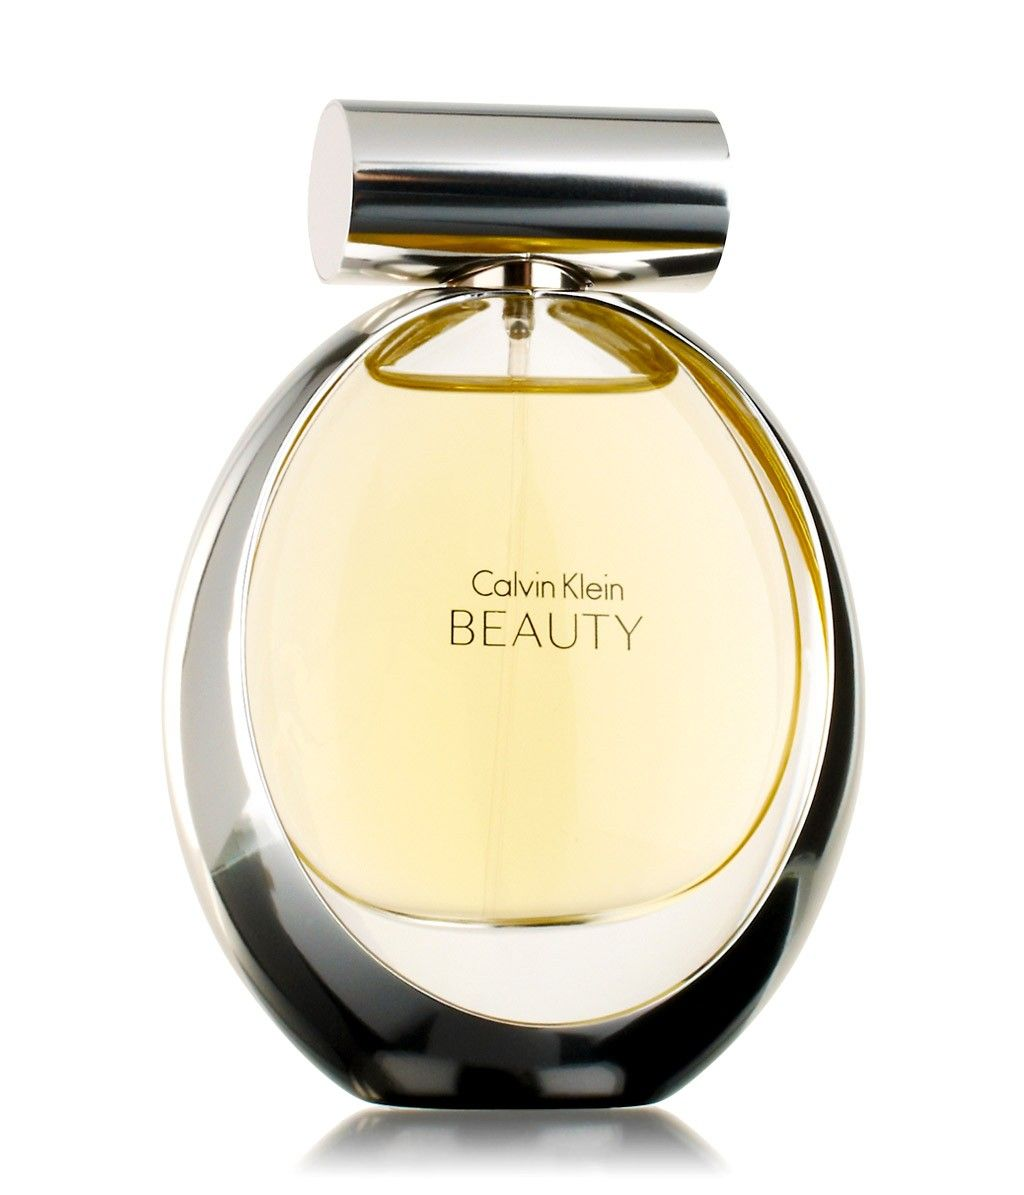 calvin klein beauty parfumklassiker pinterest calvin. Black Bedroom Furniture Sets. Home Design Ideas